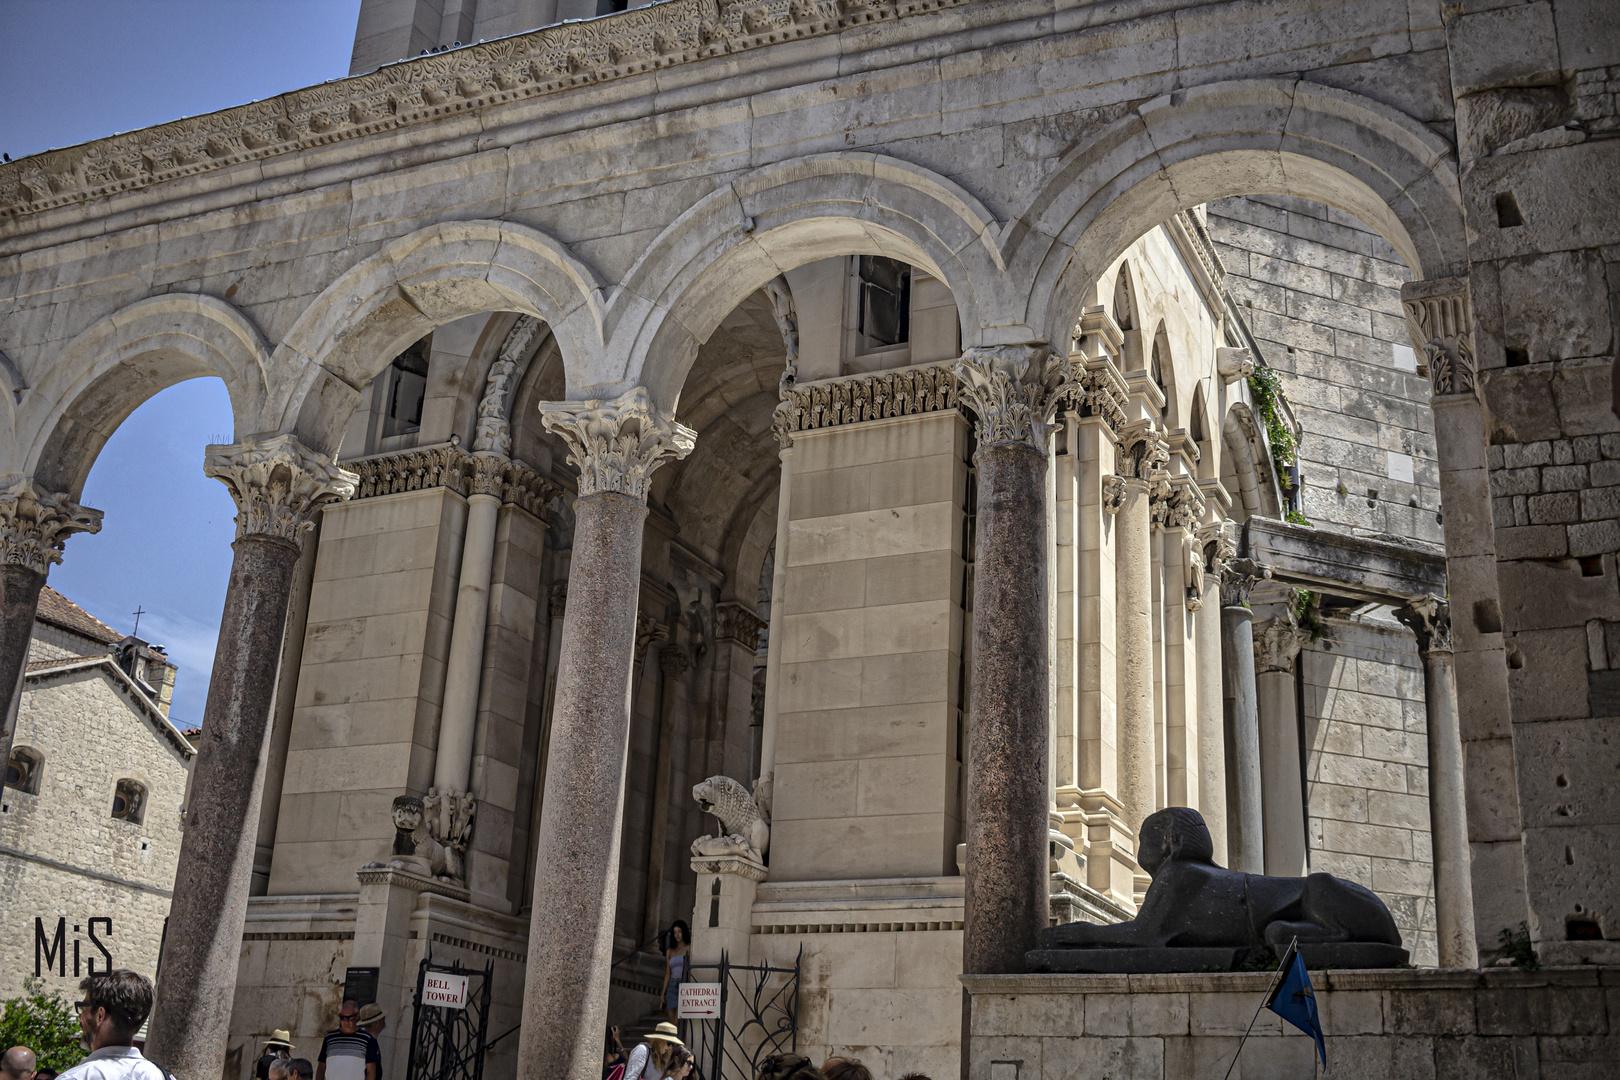 Las ruinas romanas. Palacio Diocleciasno